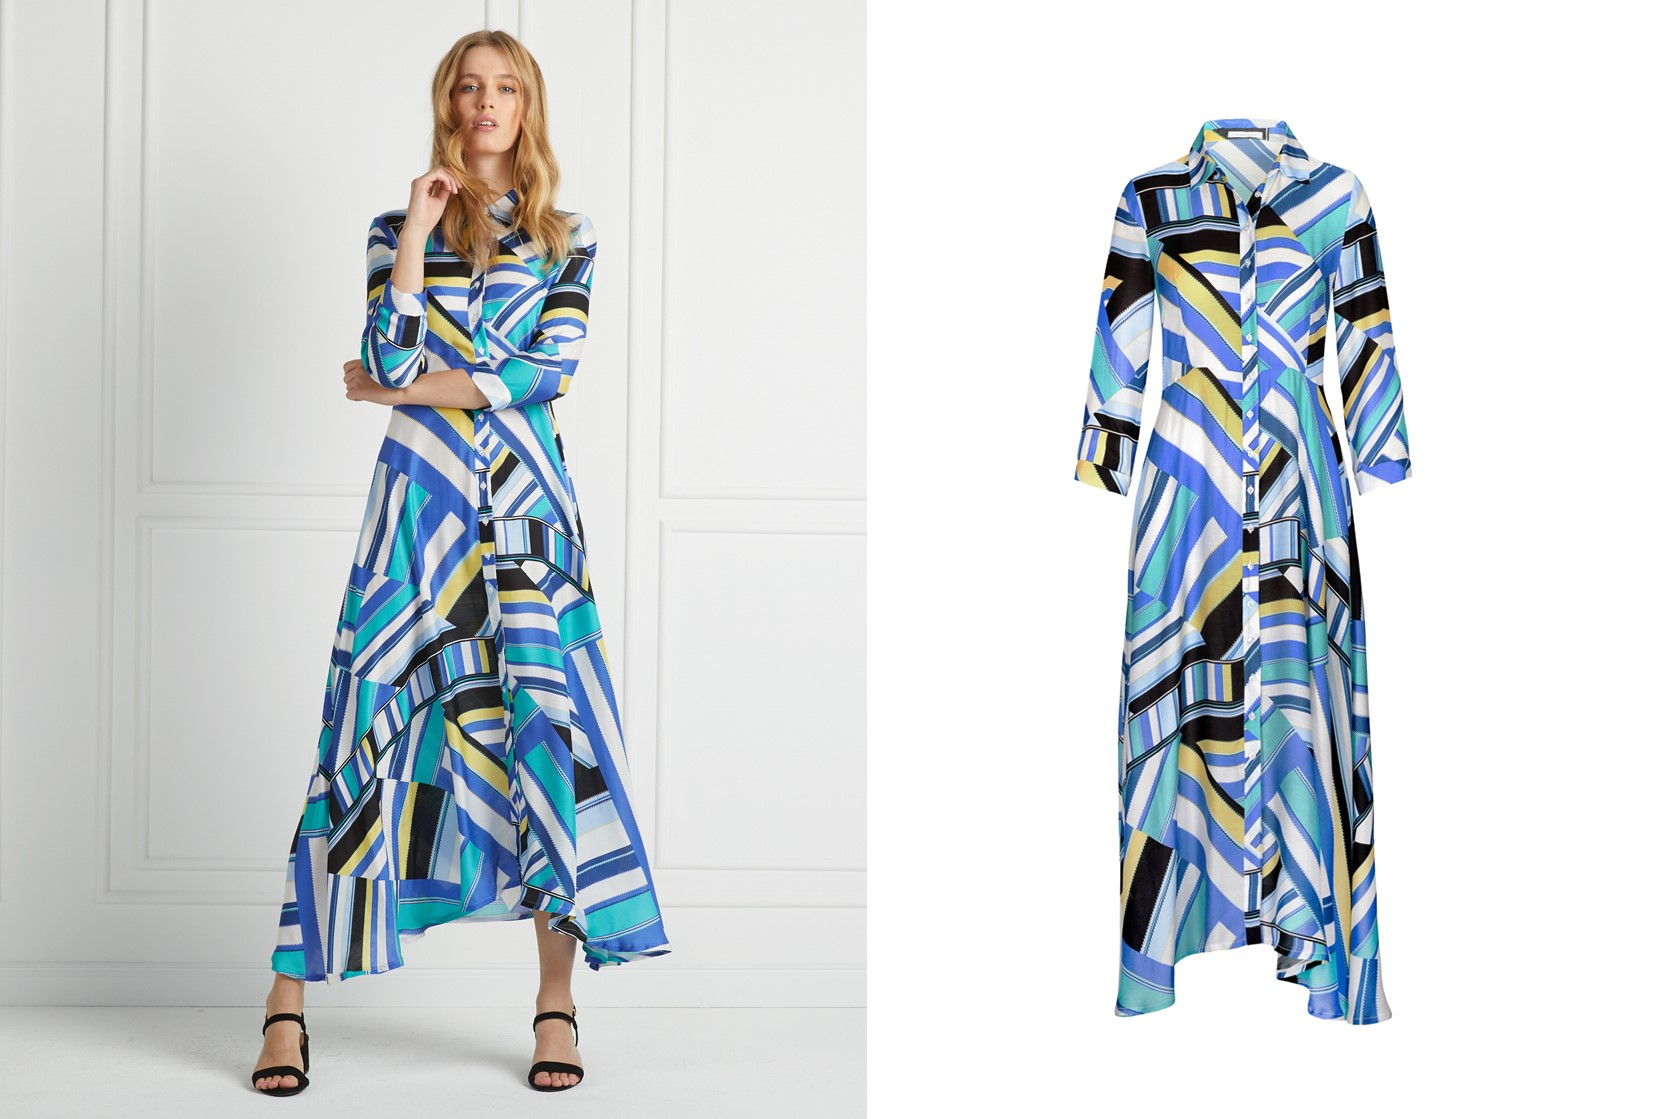 Das Kleid - Cool & Feminin